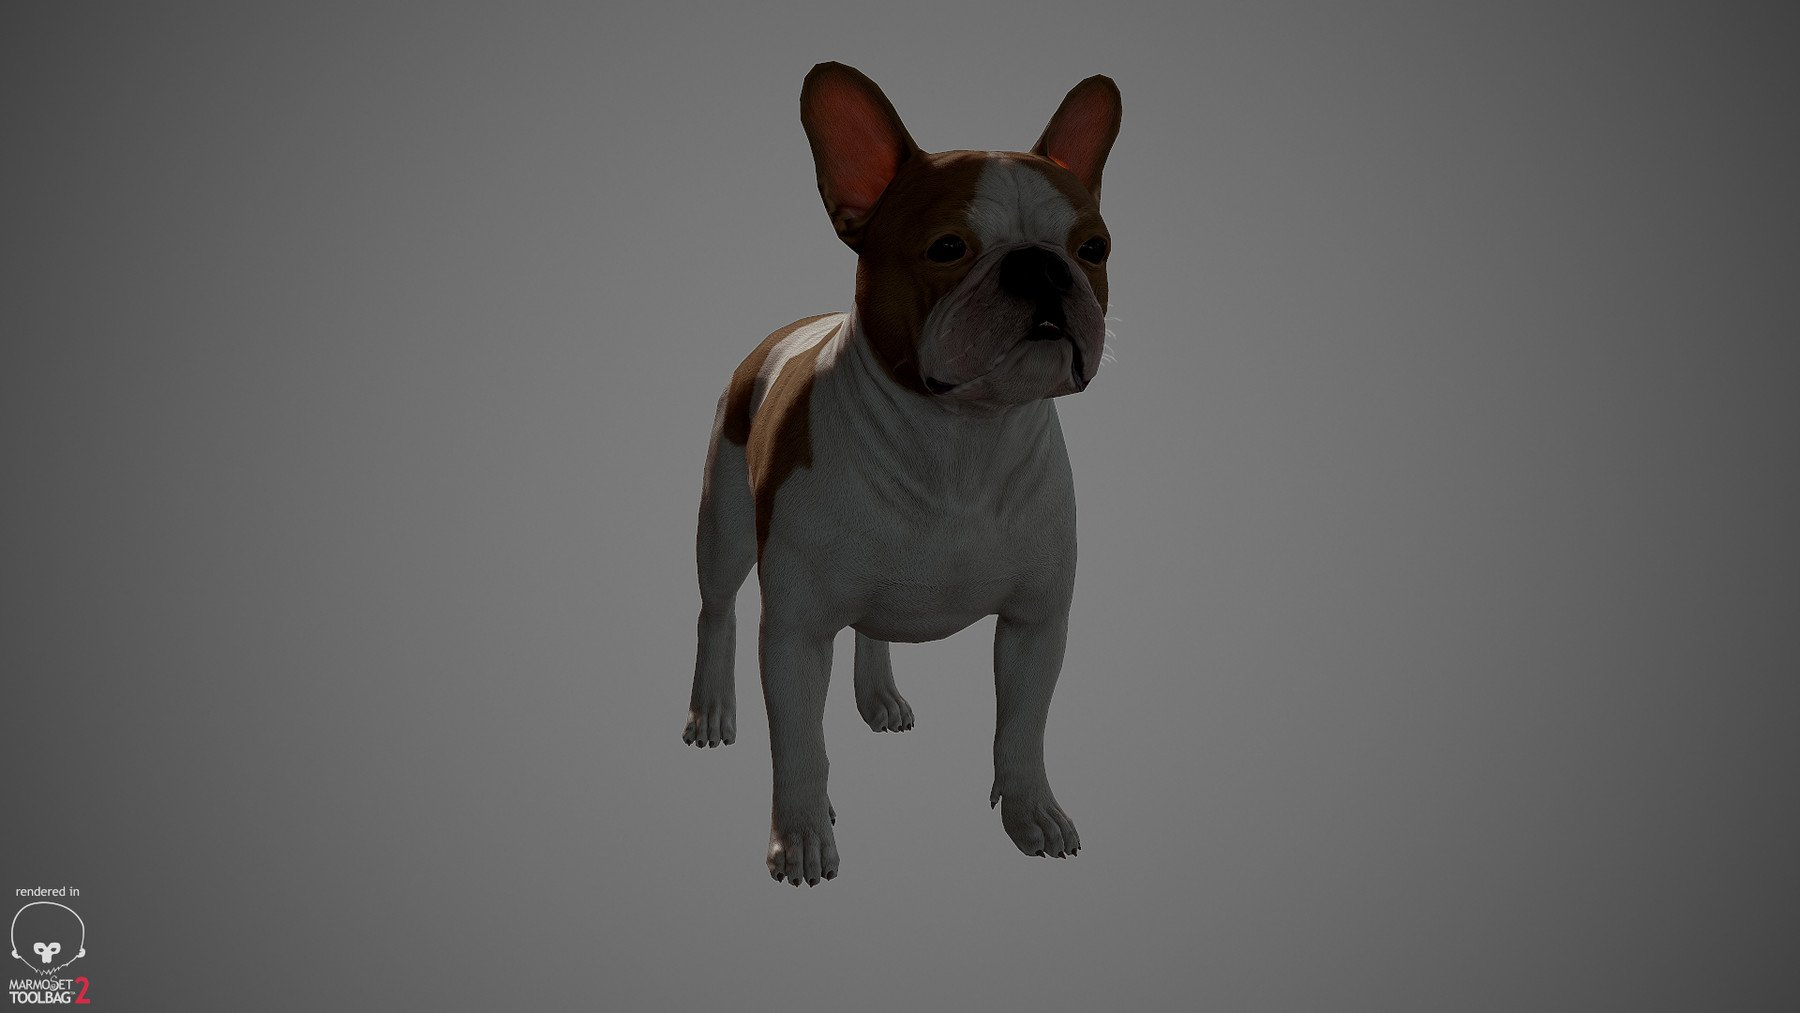 Frenchbulldog by alexlashko marmoset 10